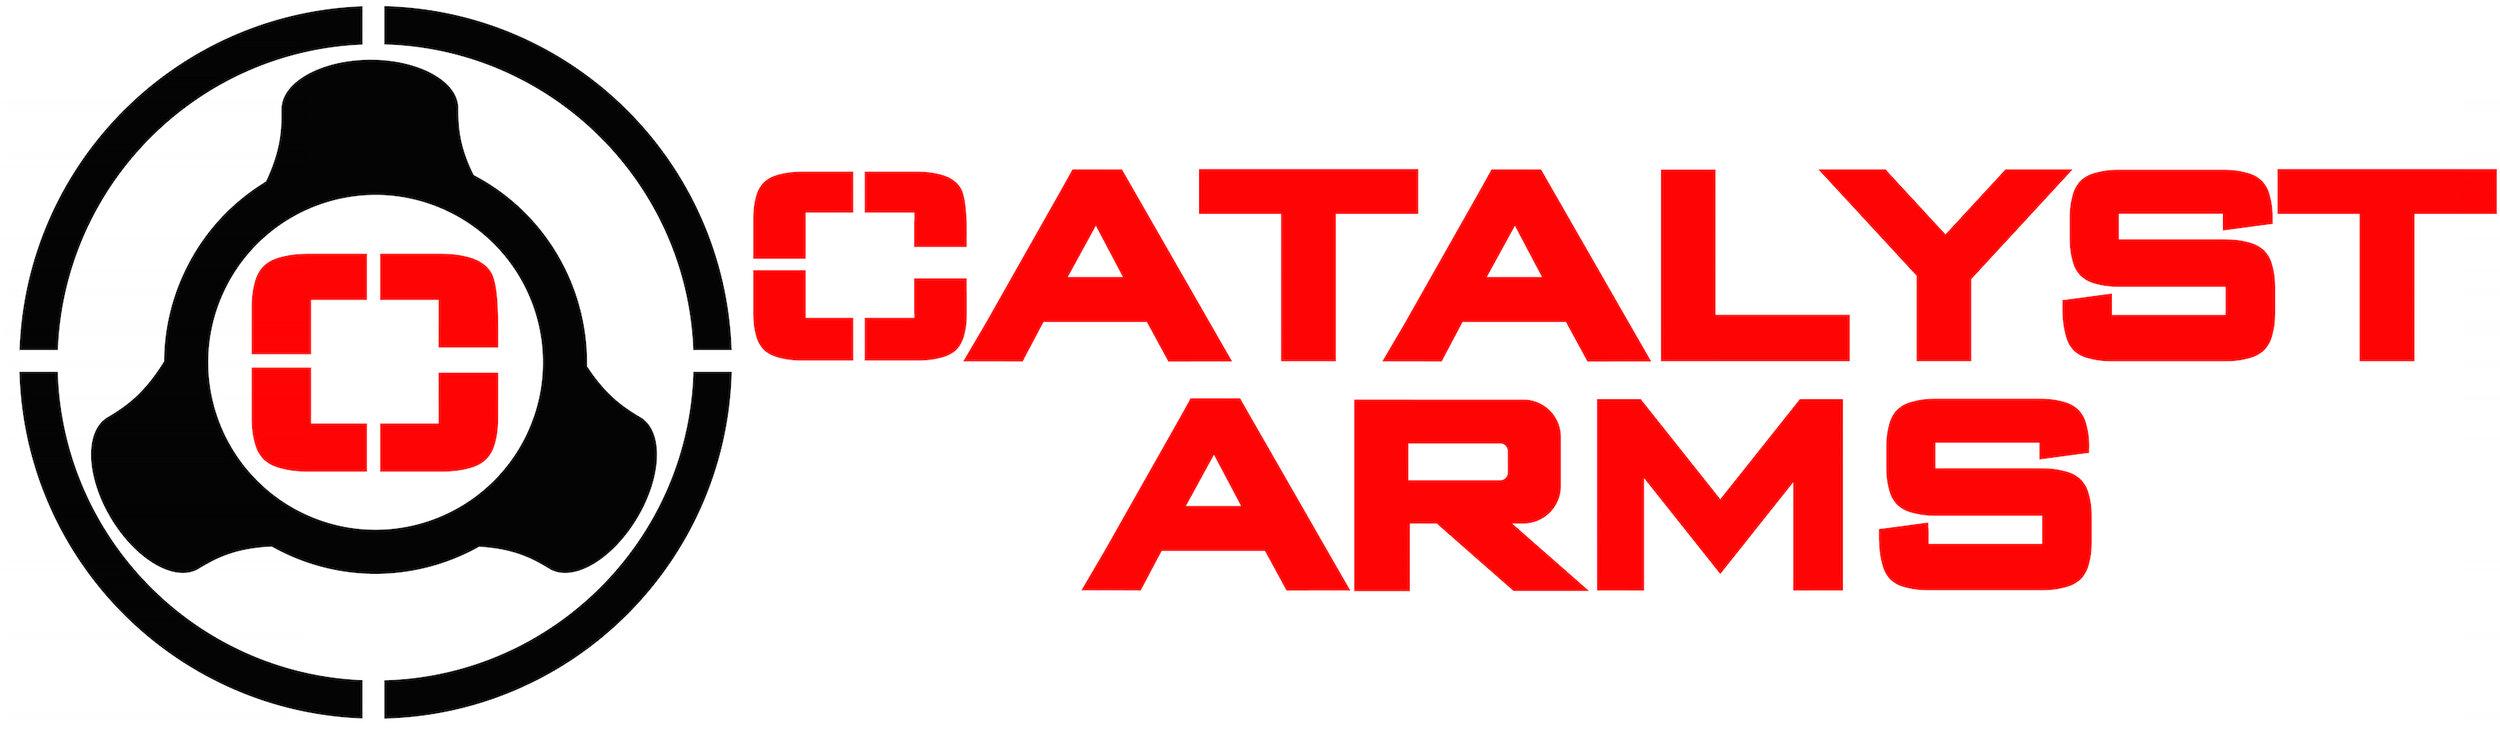 Catalyst Arms Handguard  .jpeg